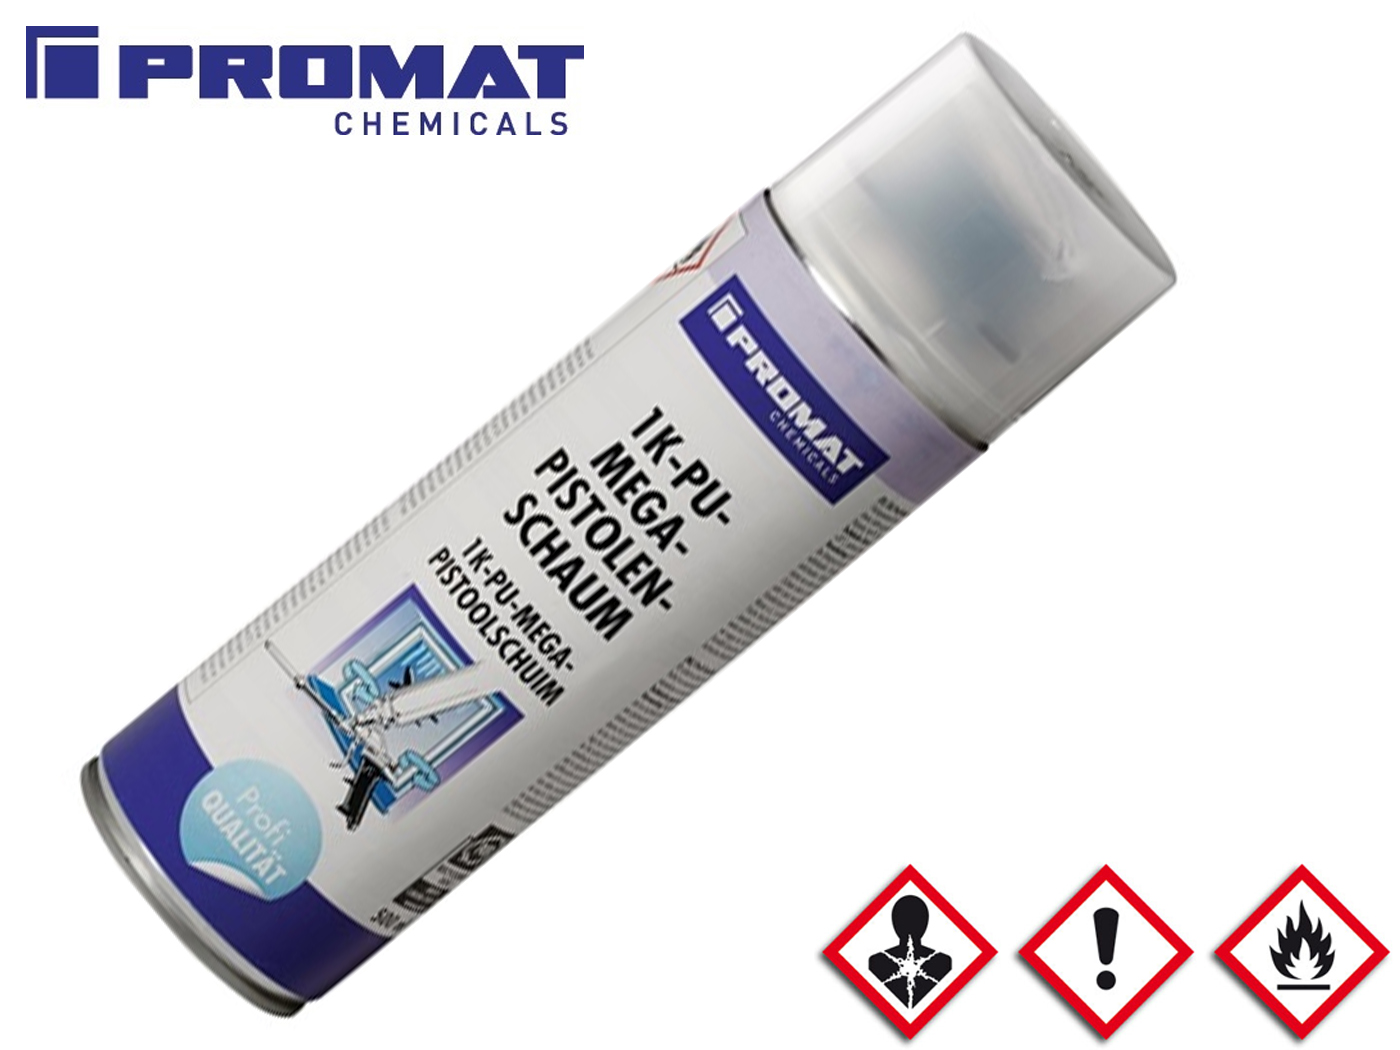 1C-pistoolschuim 500 ml B2 geel | DKMTools - DKM Tools